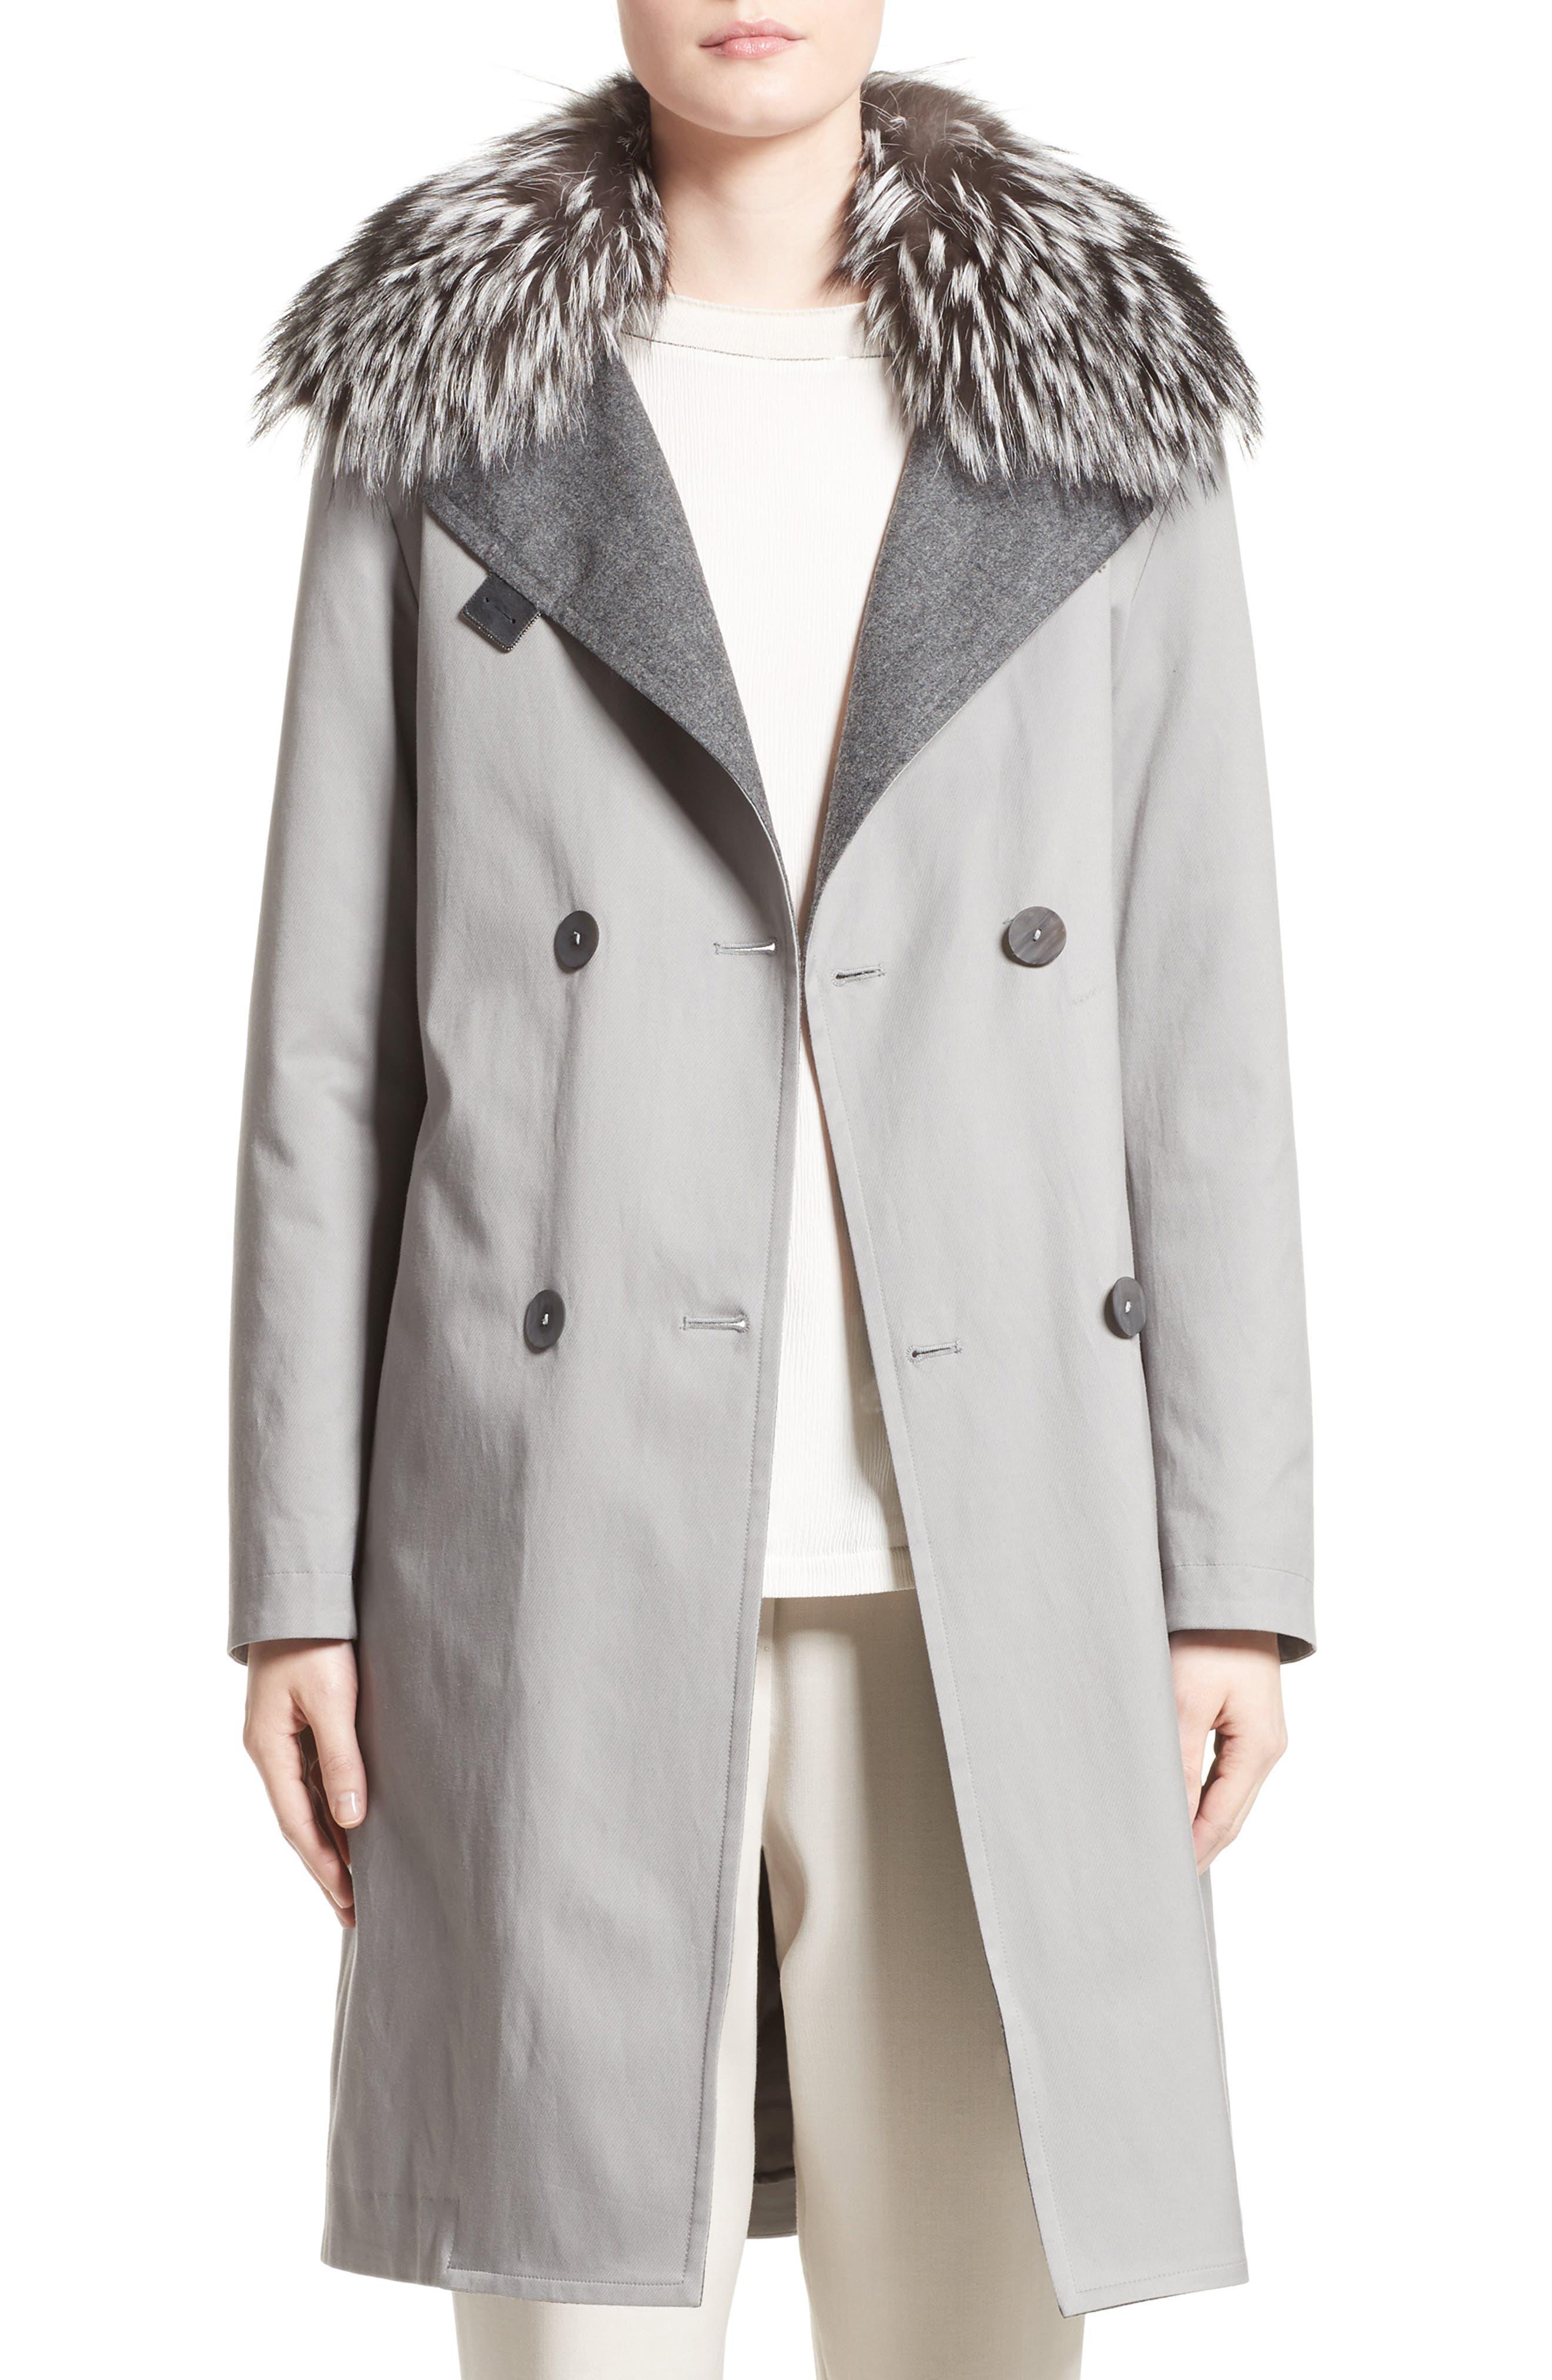 Fabiana Filippi Water Repellent Gabardine Trench Coat with Genuine Fox Fur Collar